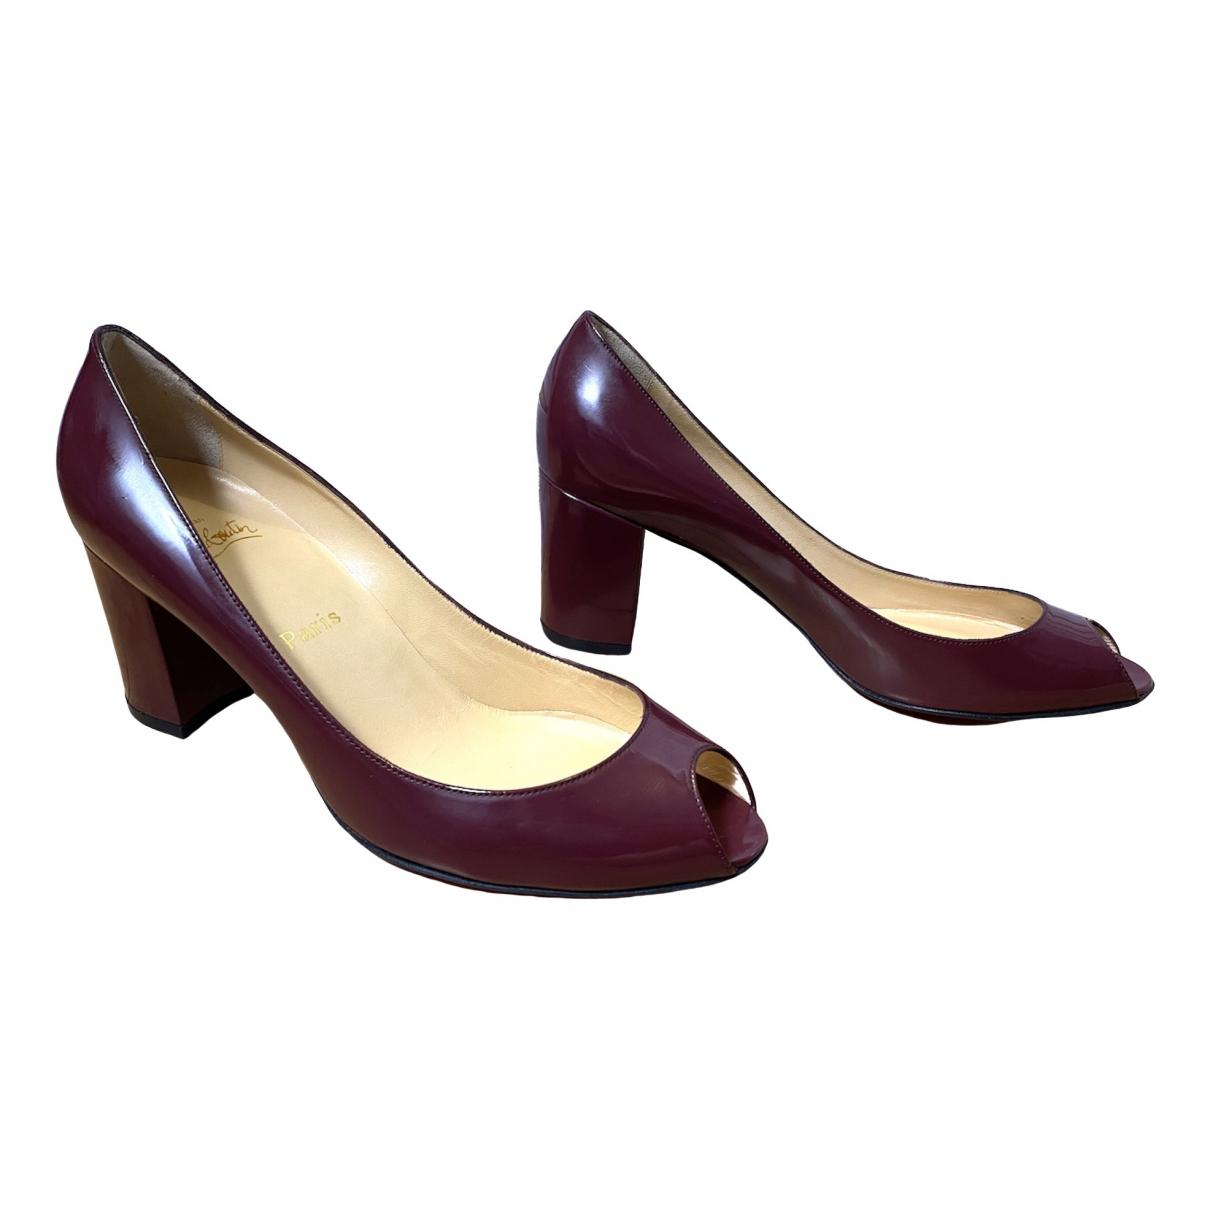 Christian Louboutin \N Burgundy Patent leather Heels for Women 40 EU